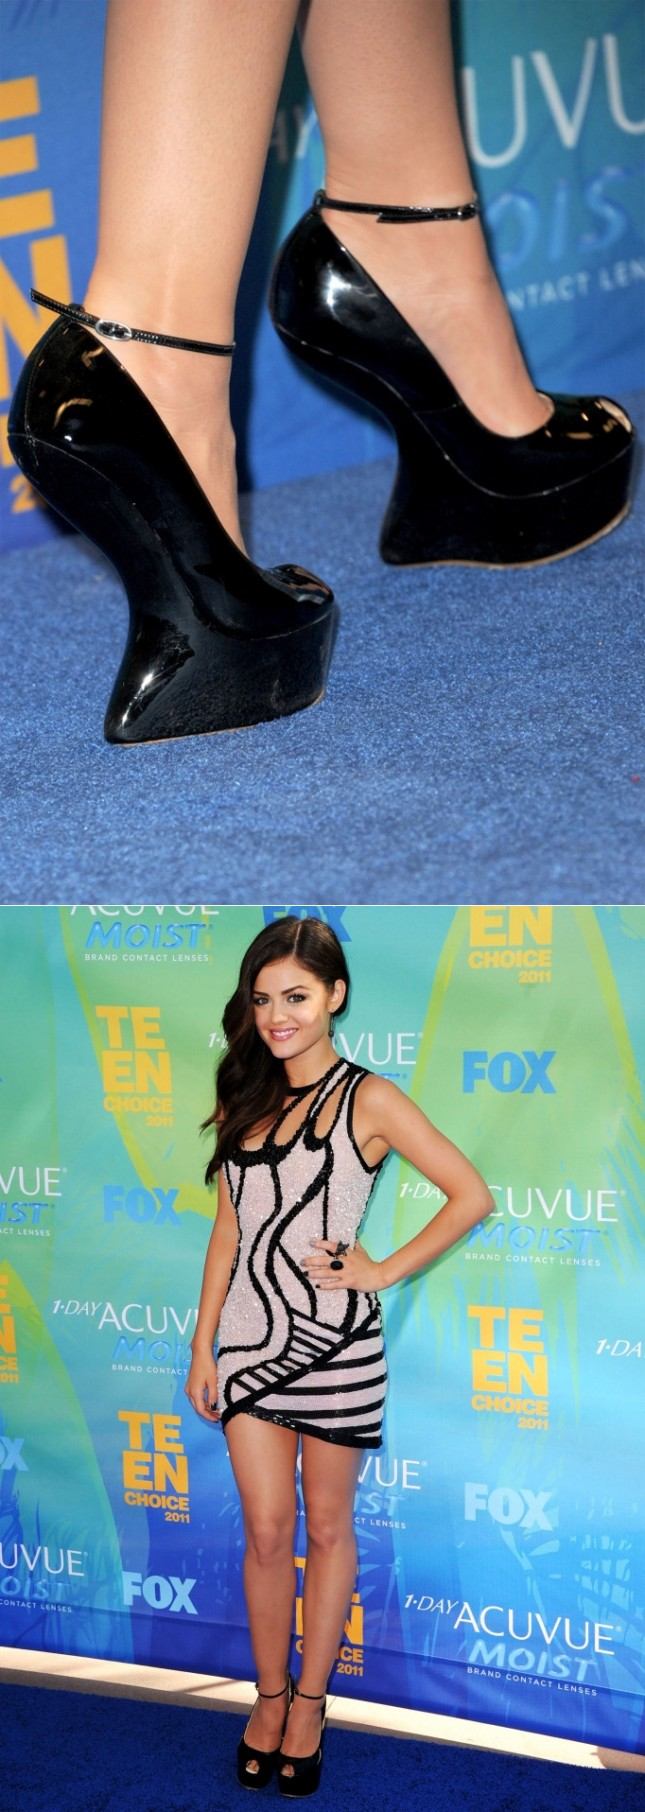 Sapato Lucy Hale Teen Choices Awards